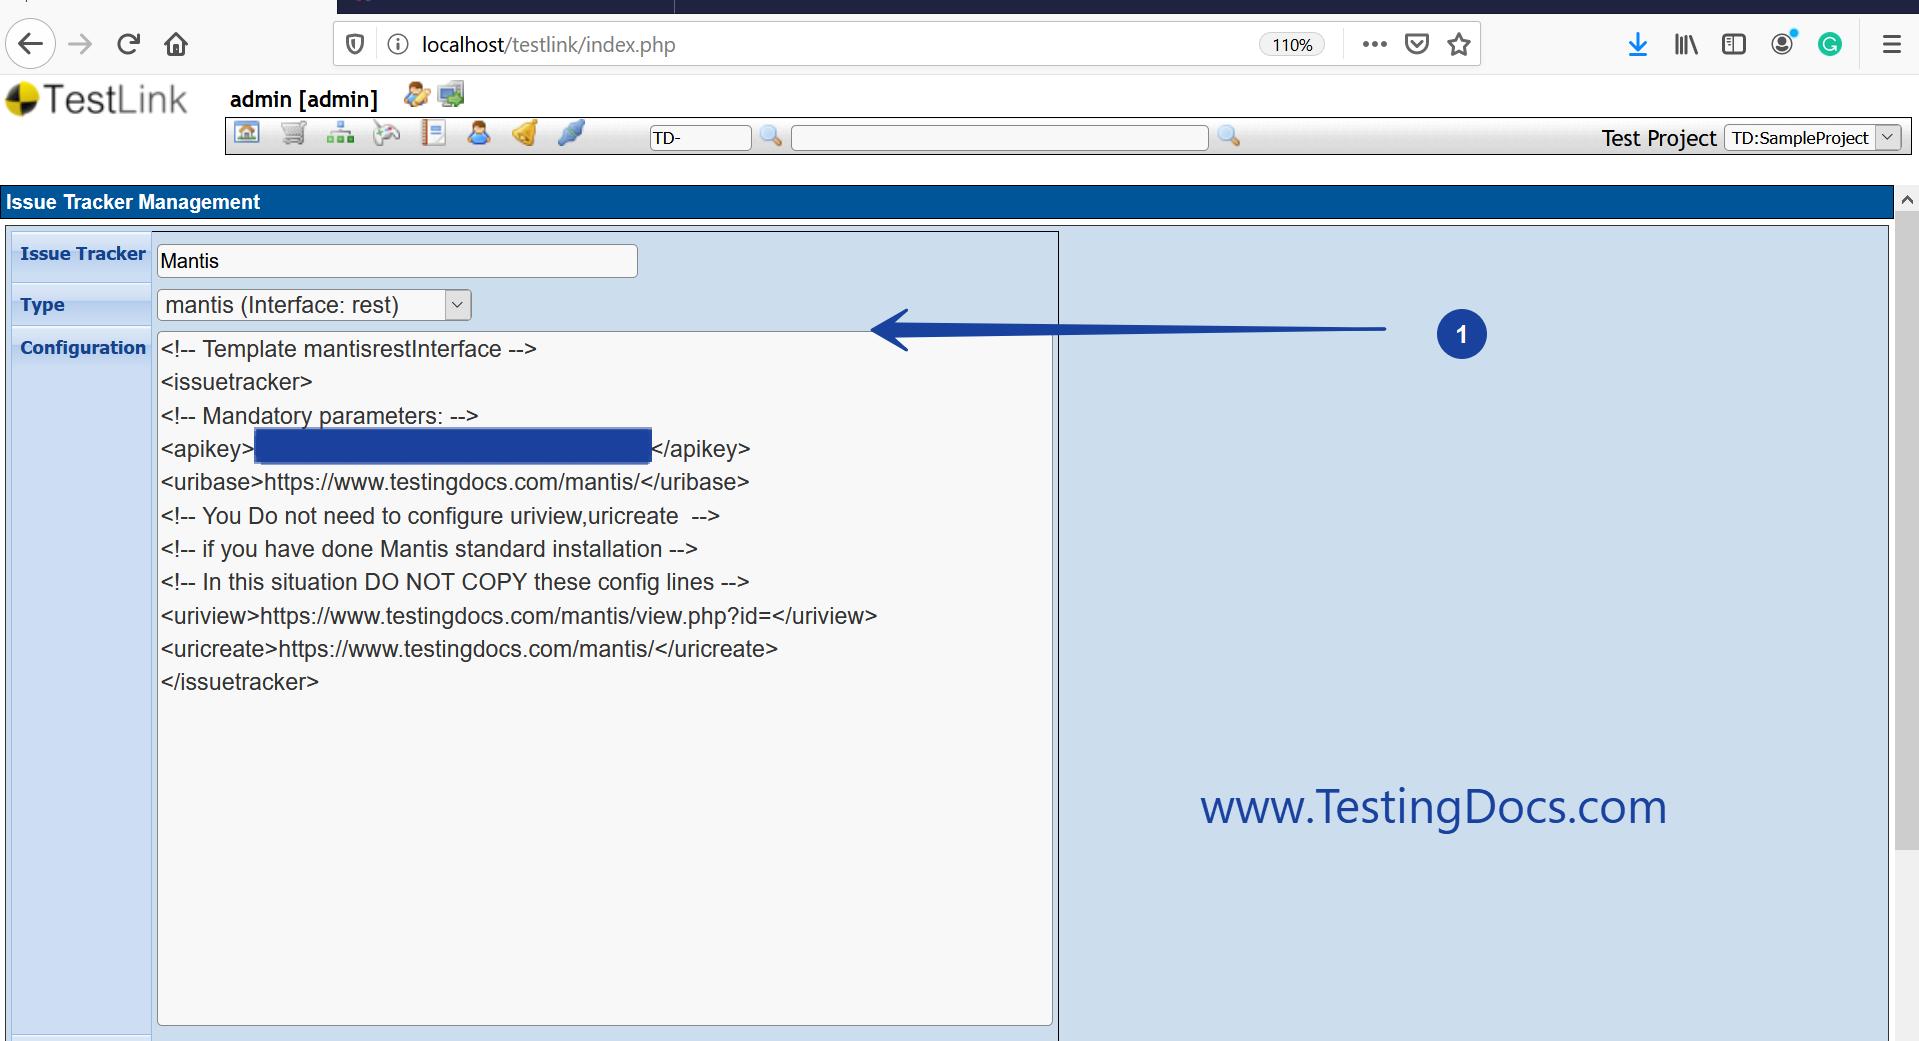 Mantis REST API Configuration